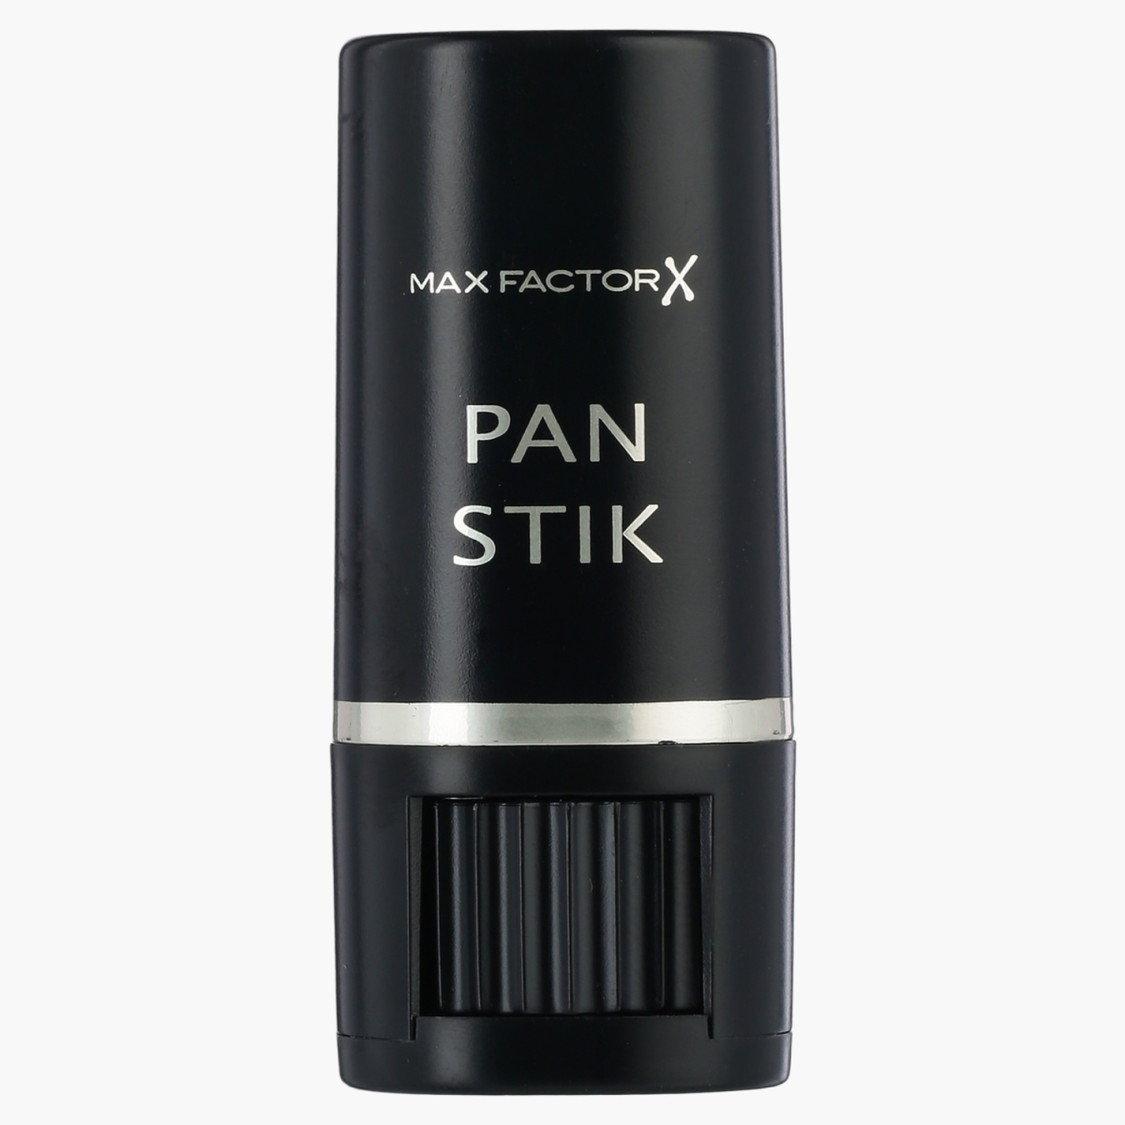 Max Factor Panstik Foundation